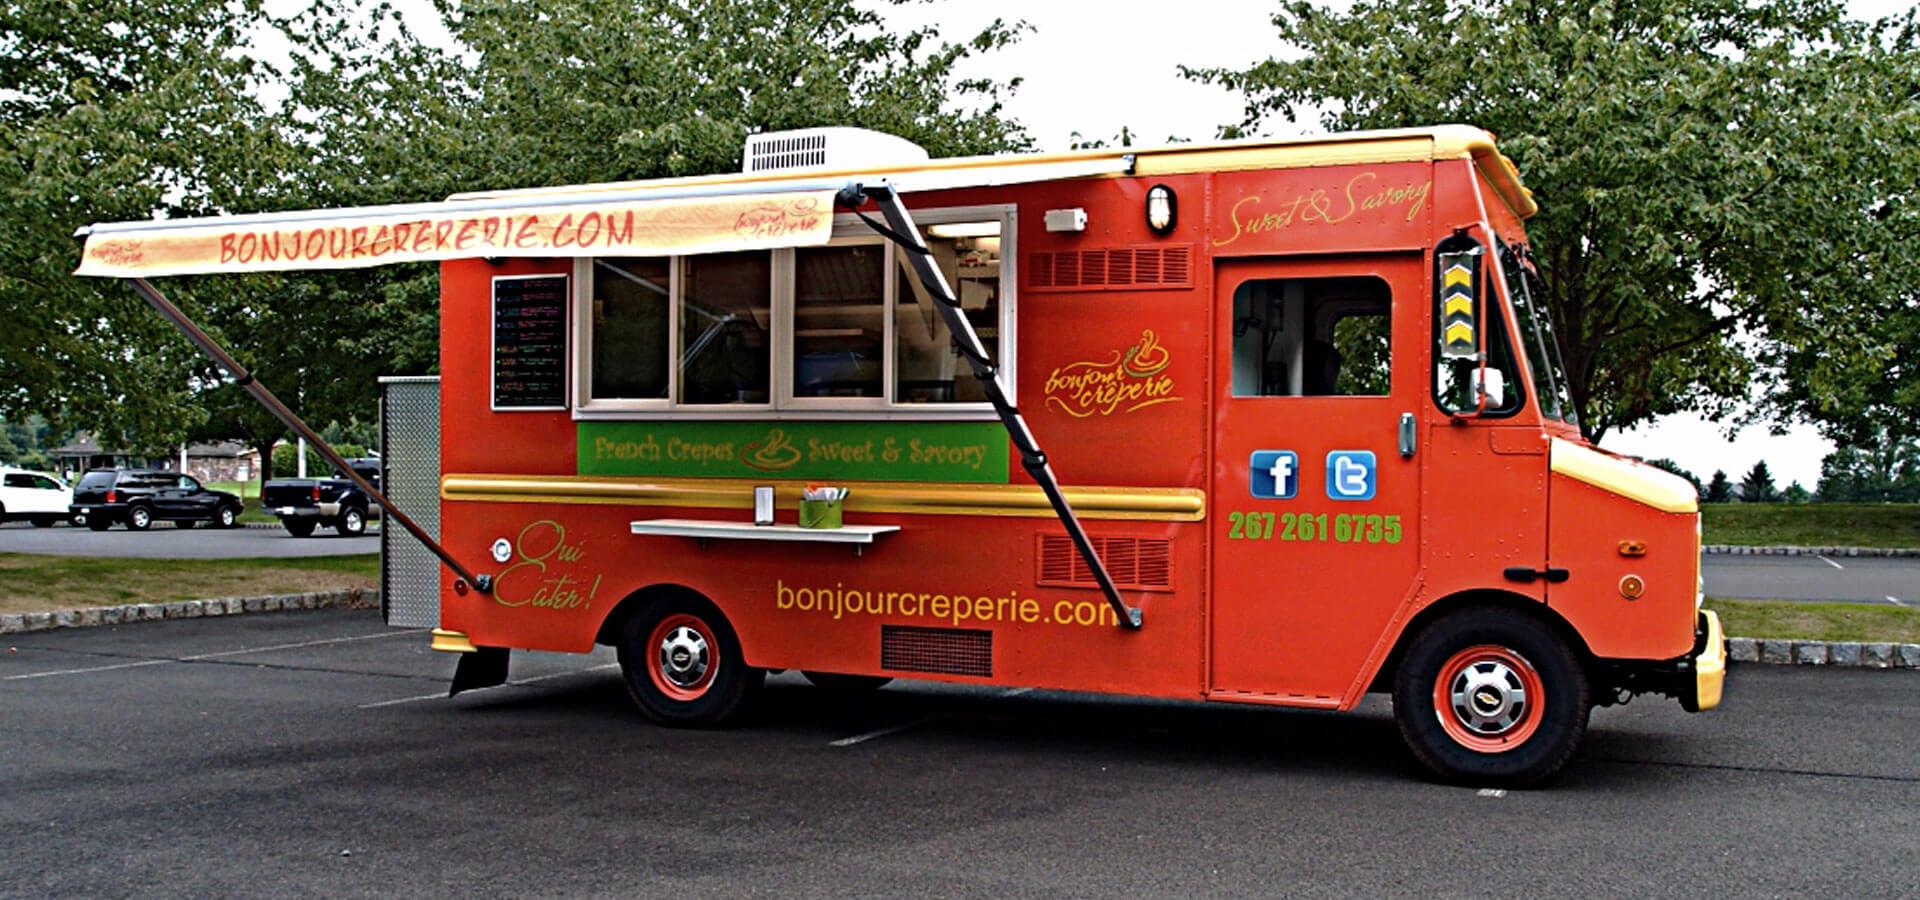 Bonjour Creperie Food Truck